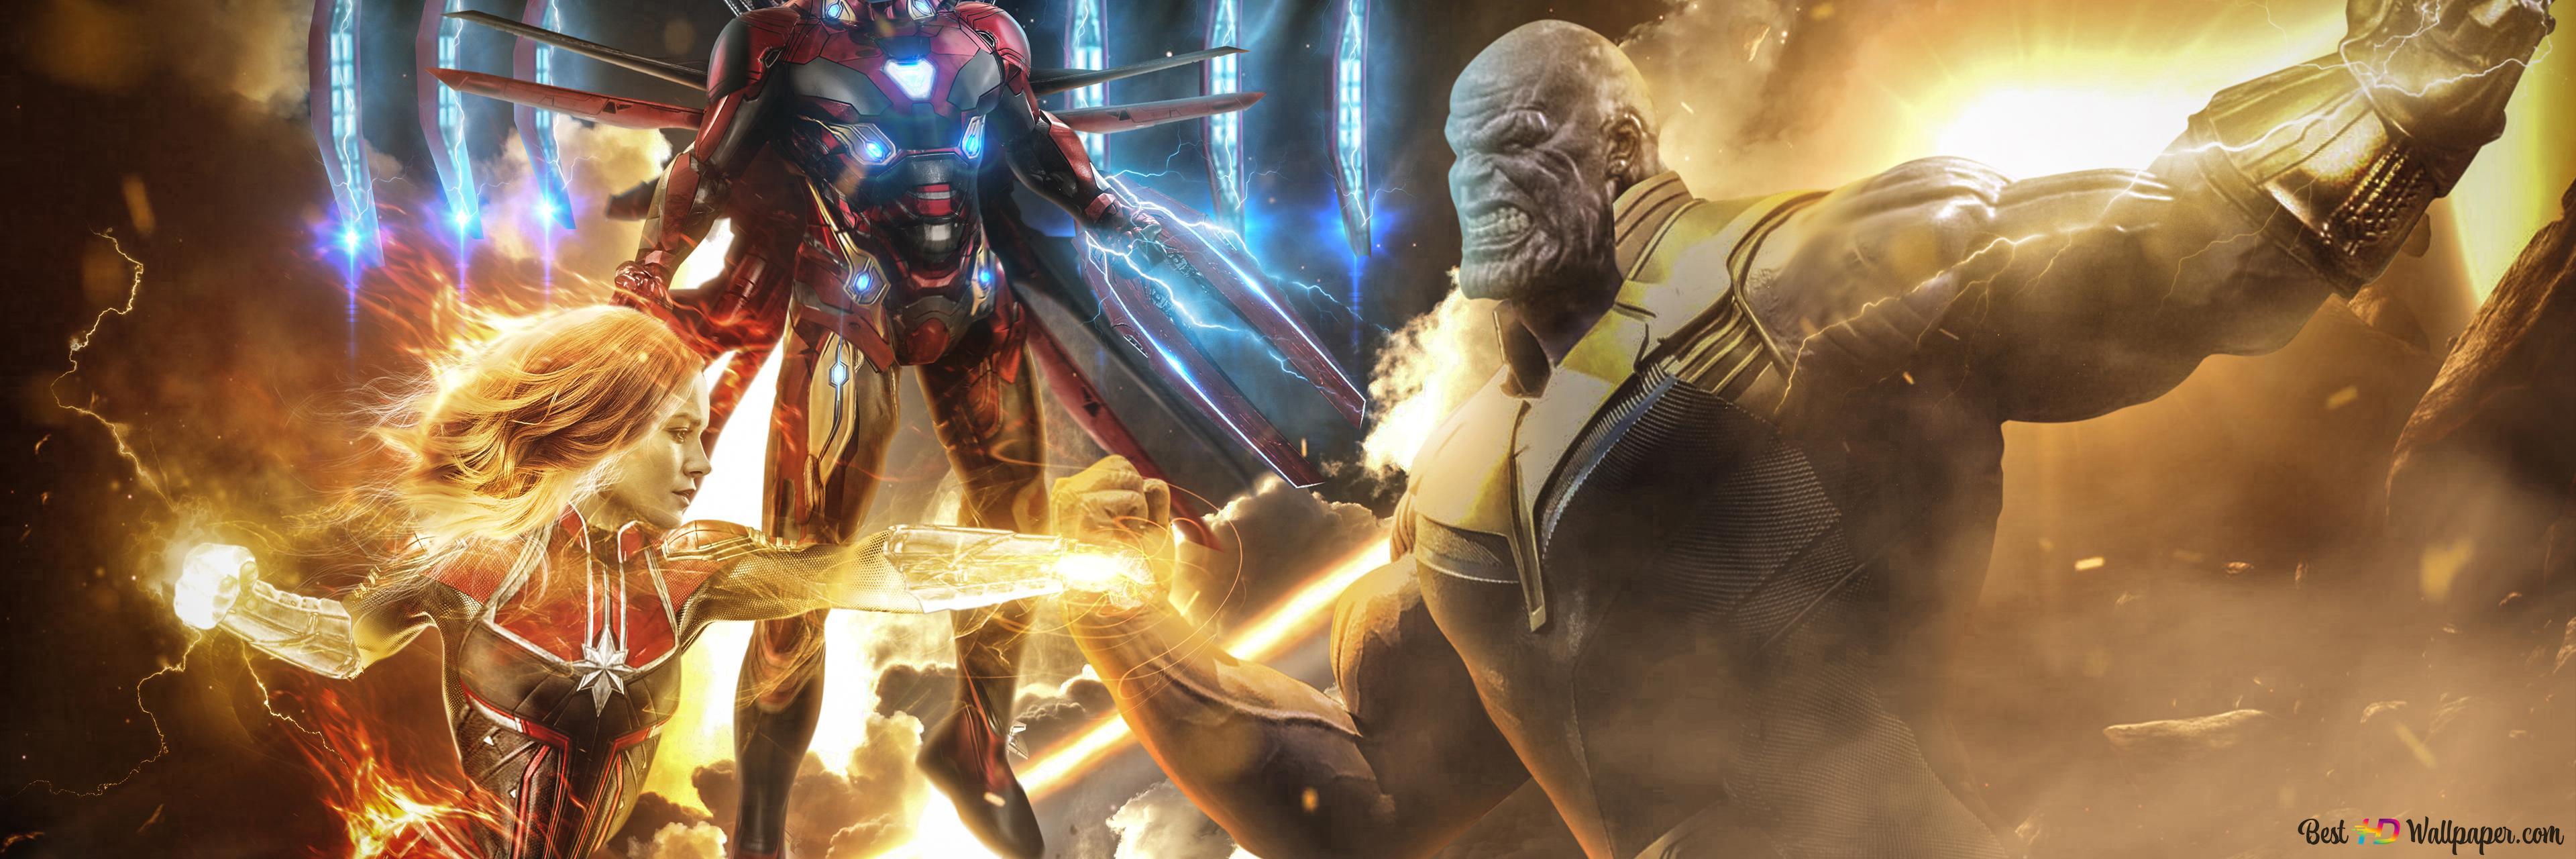 Endgame Thanos Vs Iron Man And Captain Marvel Hd Wallpaper Download